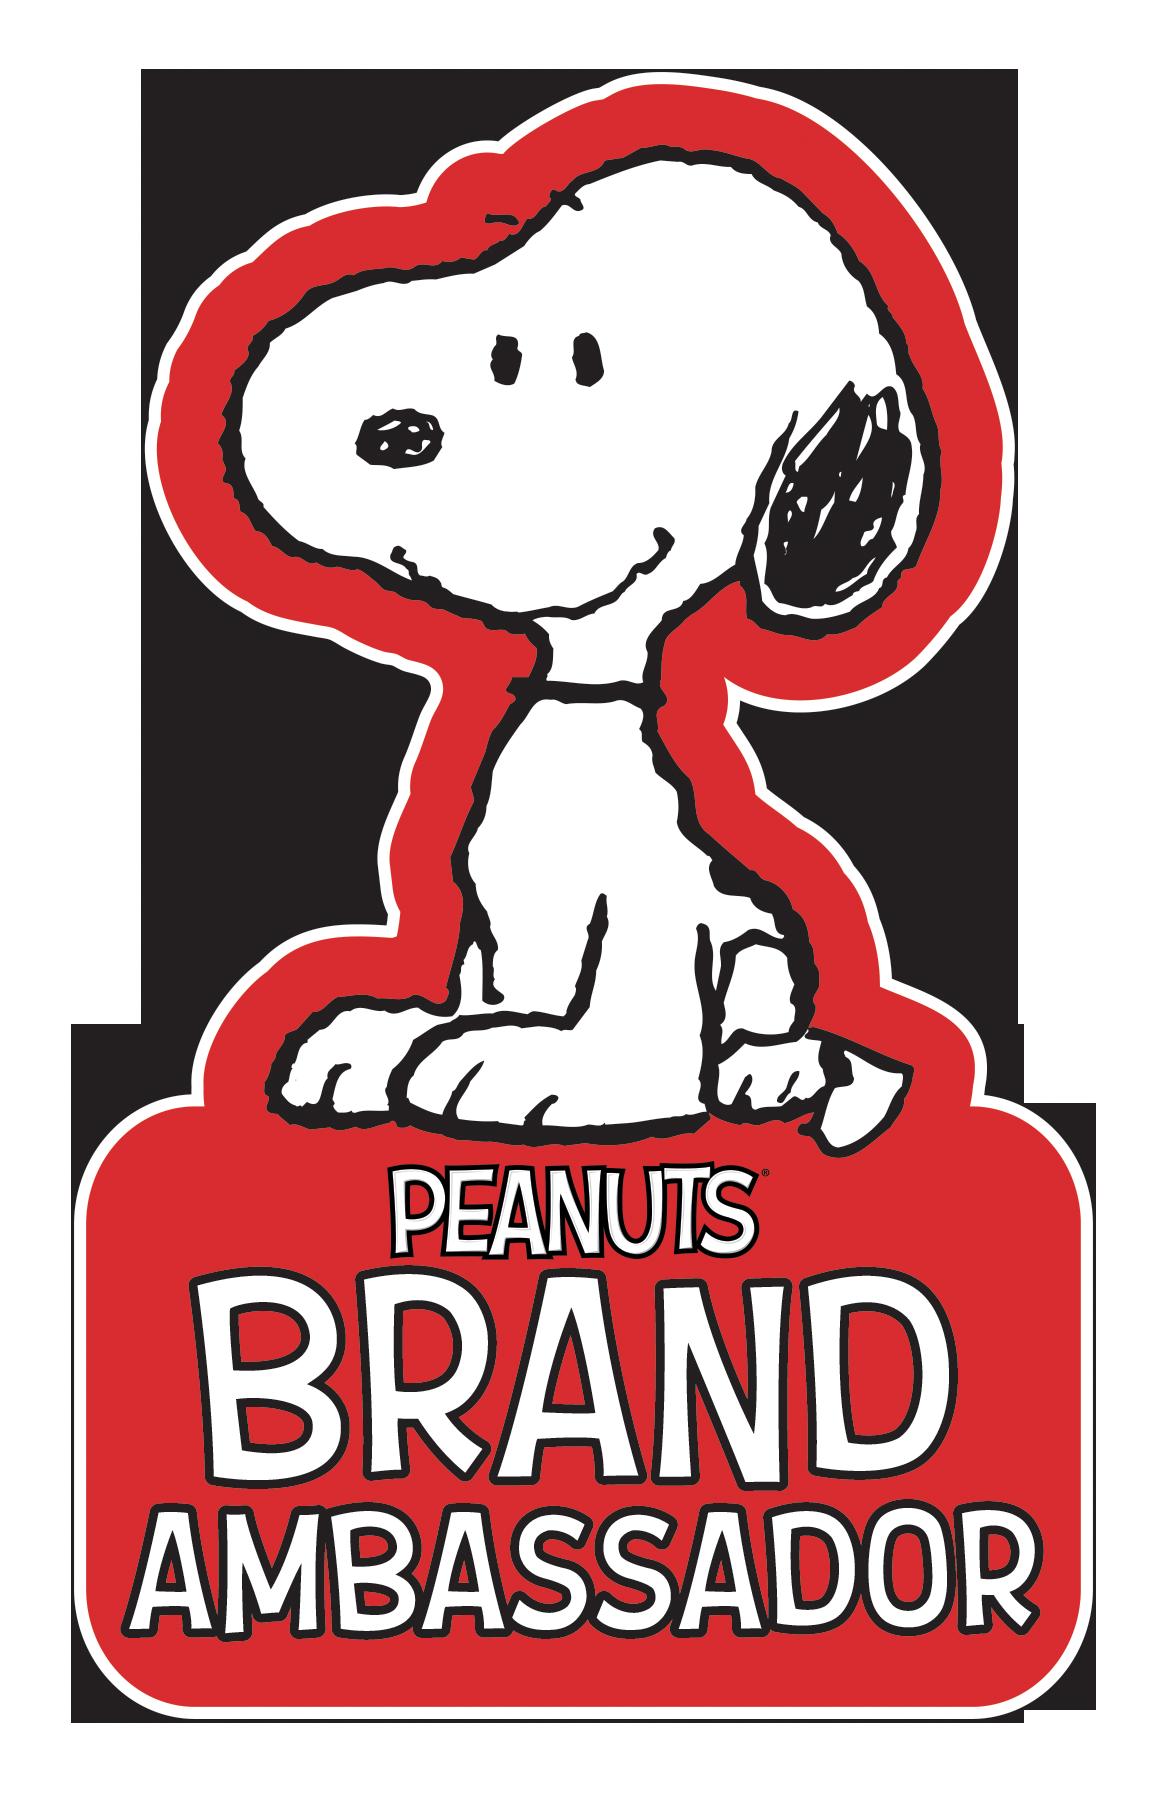 Peanuts-Brand-Ambassador-Badge